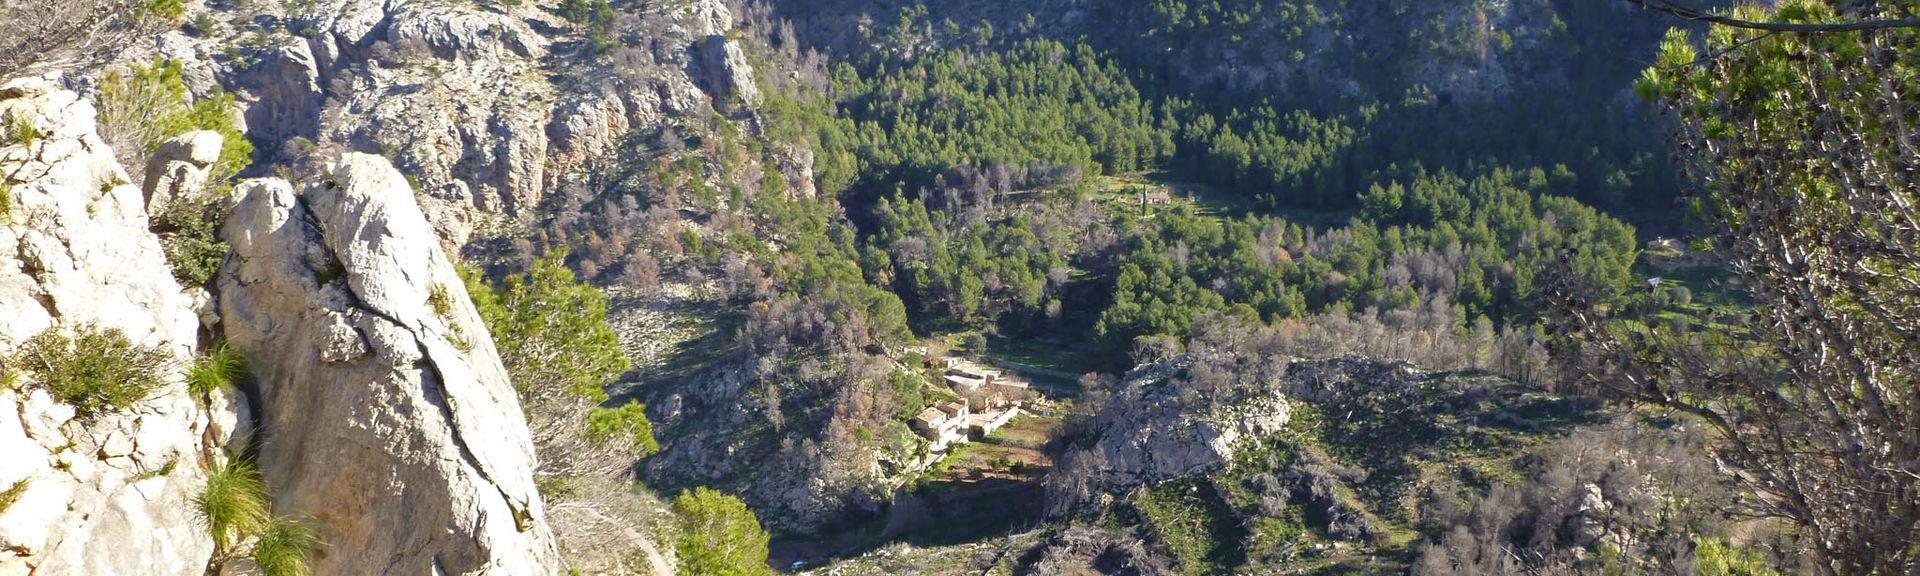 El Toro, Baleary, Hiszpania